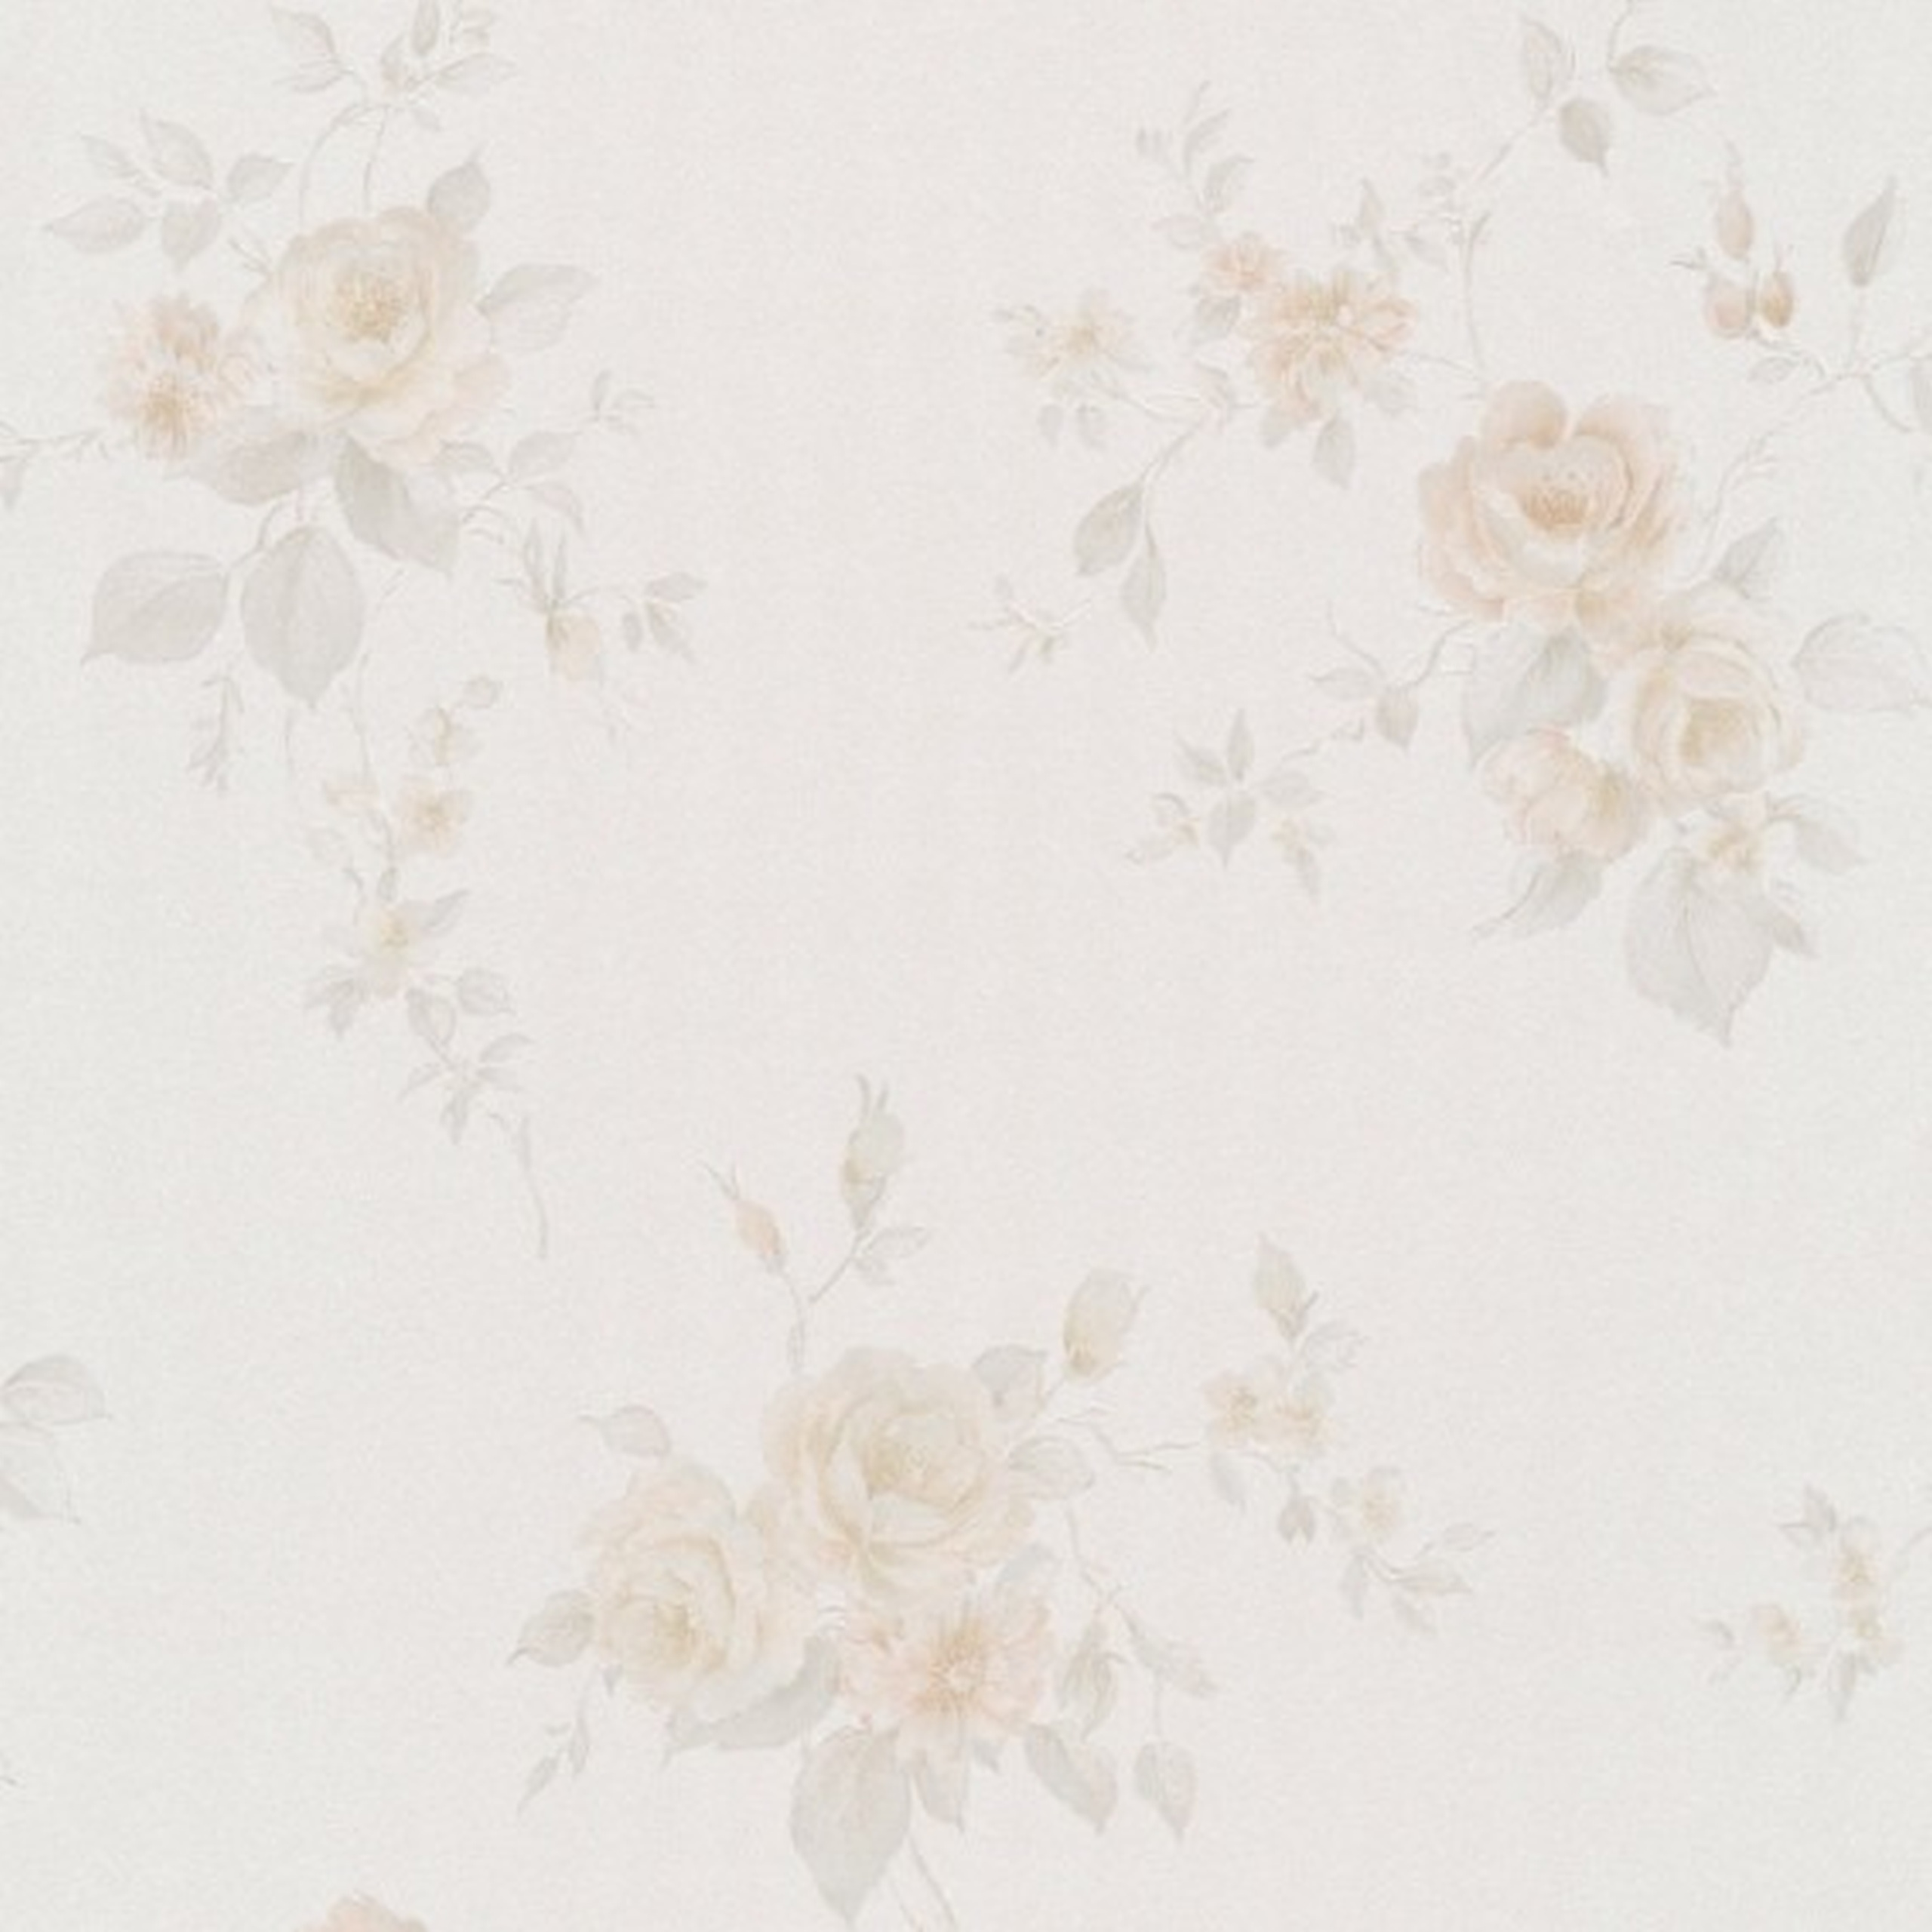 A.S. Creation Tapete Kollektion Styleguide Klassisch 2019 978318 Blumen